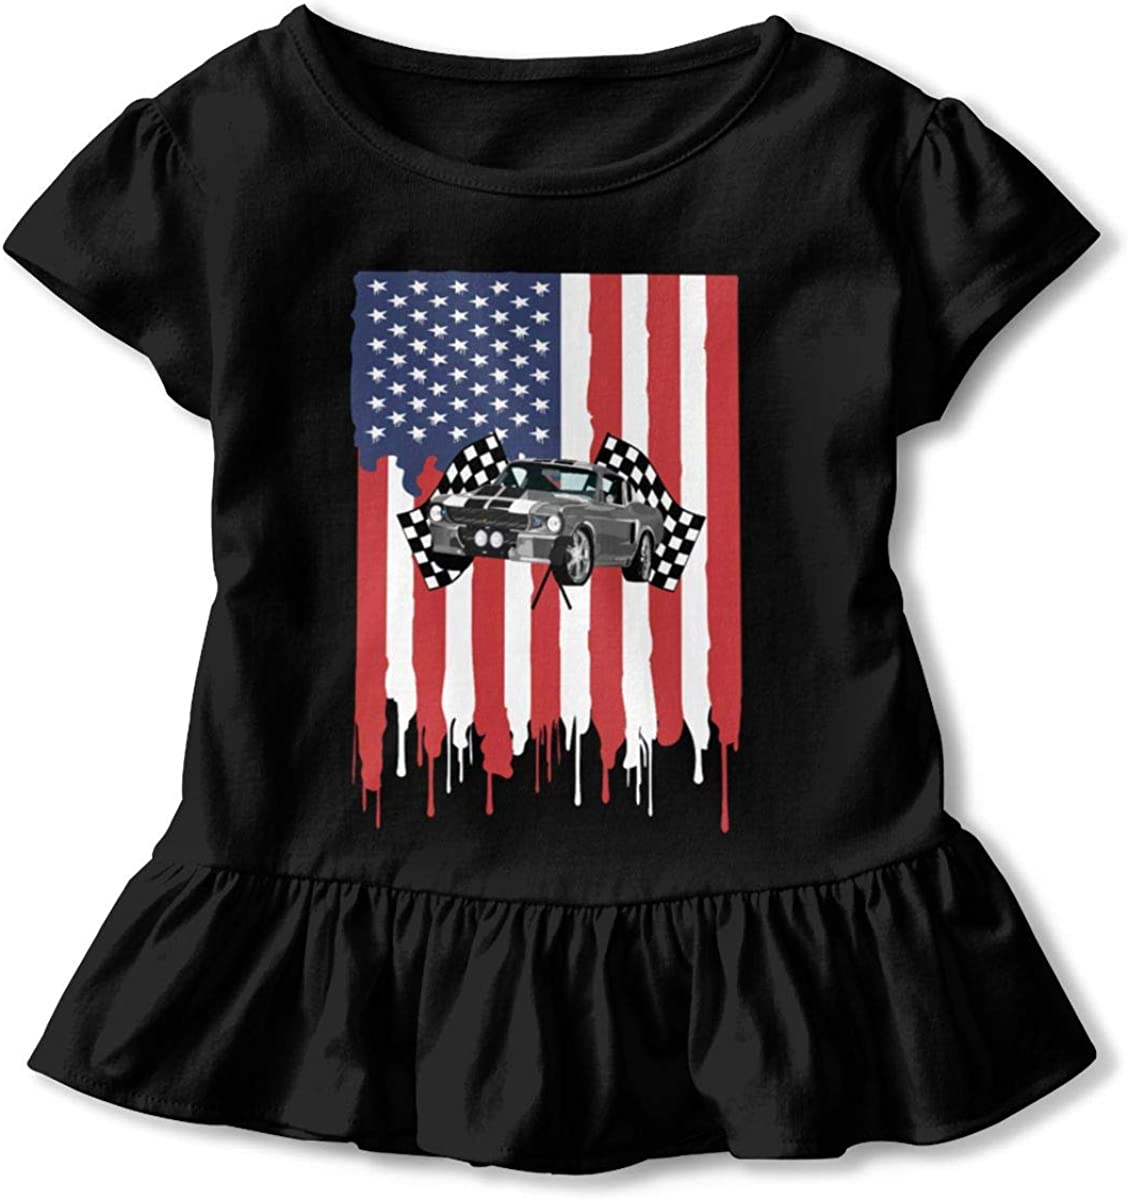 Jumping American Flag Unicorn Kids Girls Ruffled Short Sleeve Tshirt